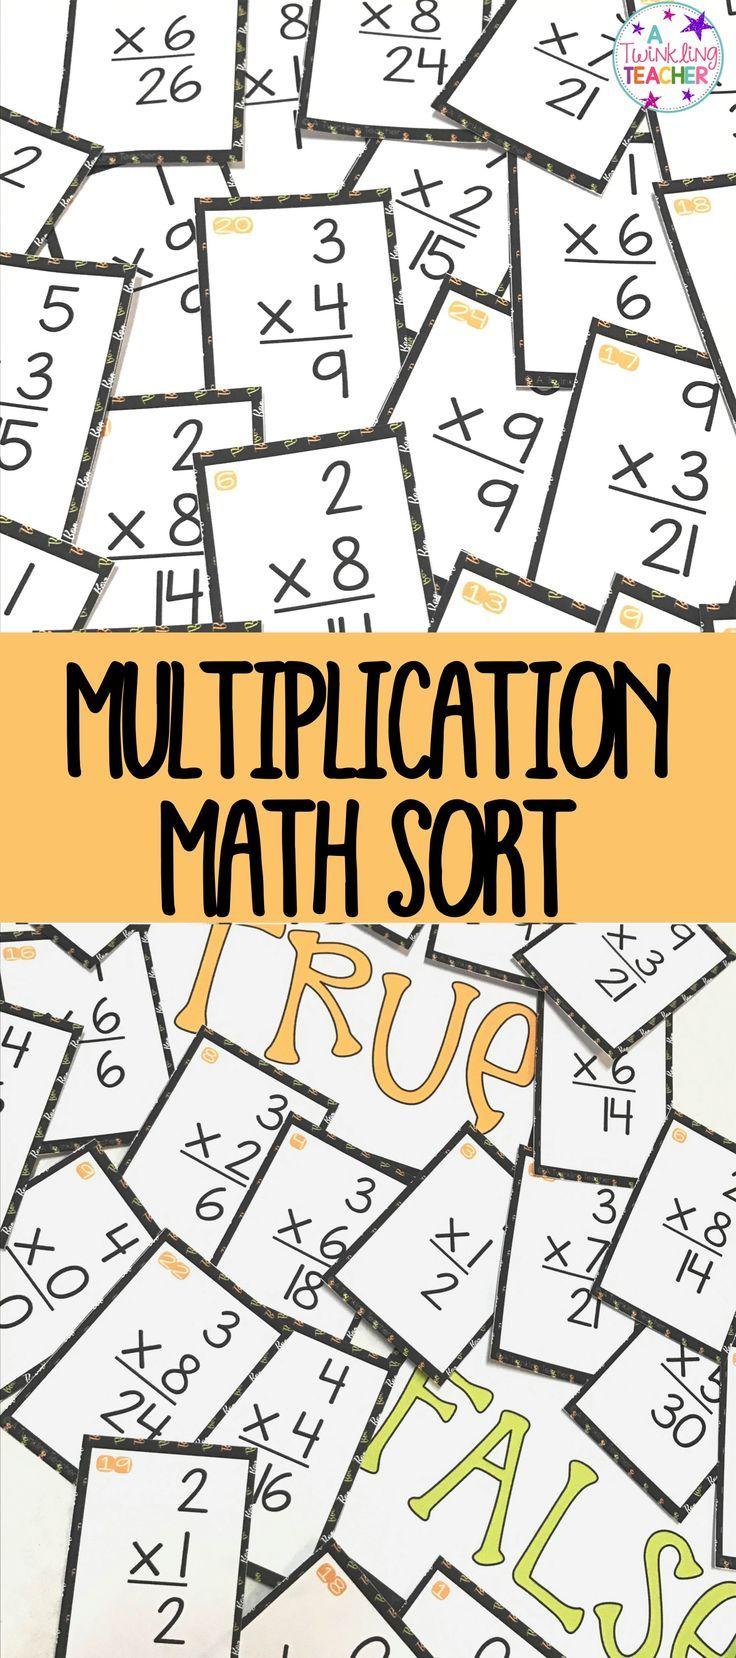 Halloween multiplication math center sort | Multiplication facts ...